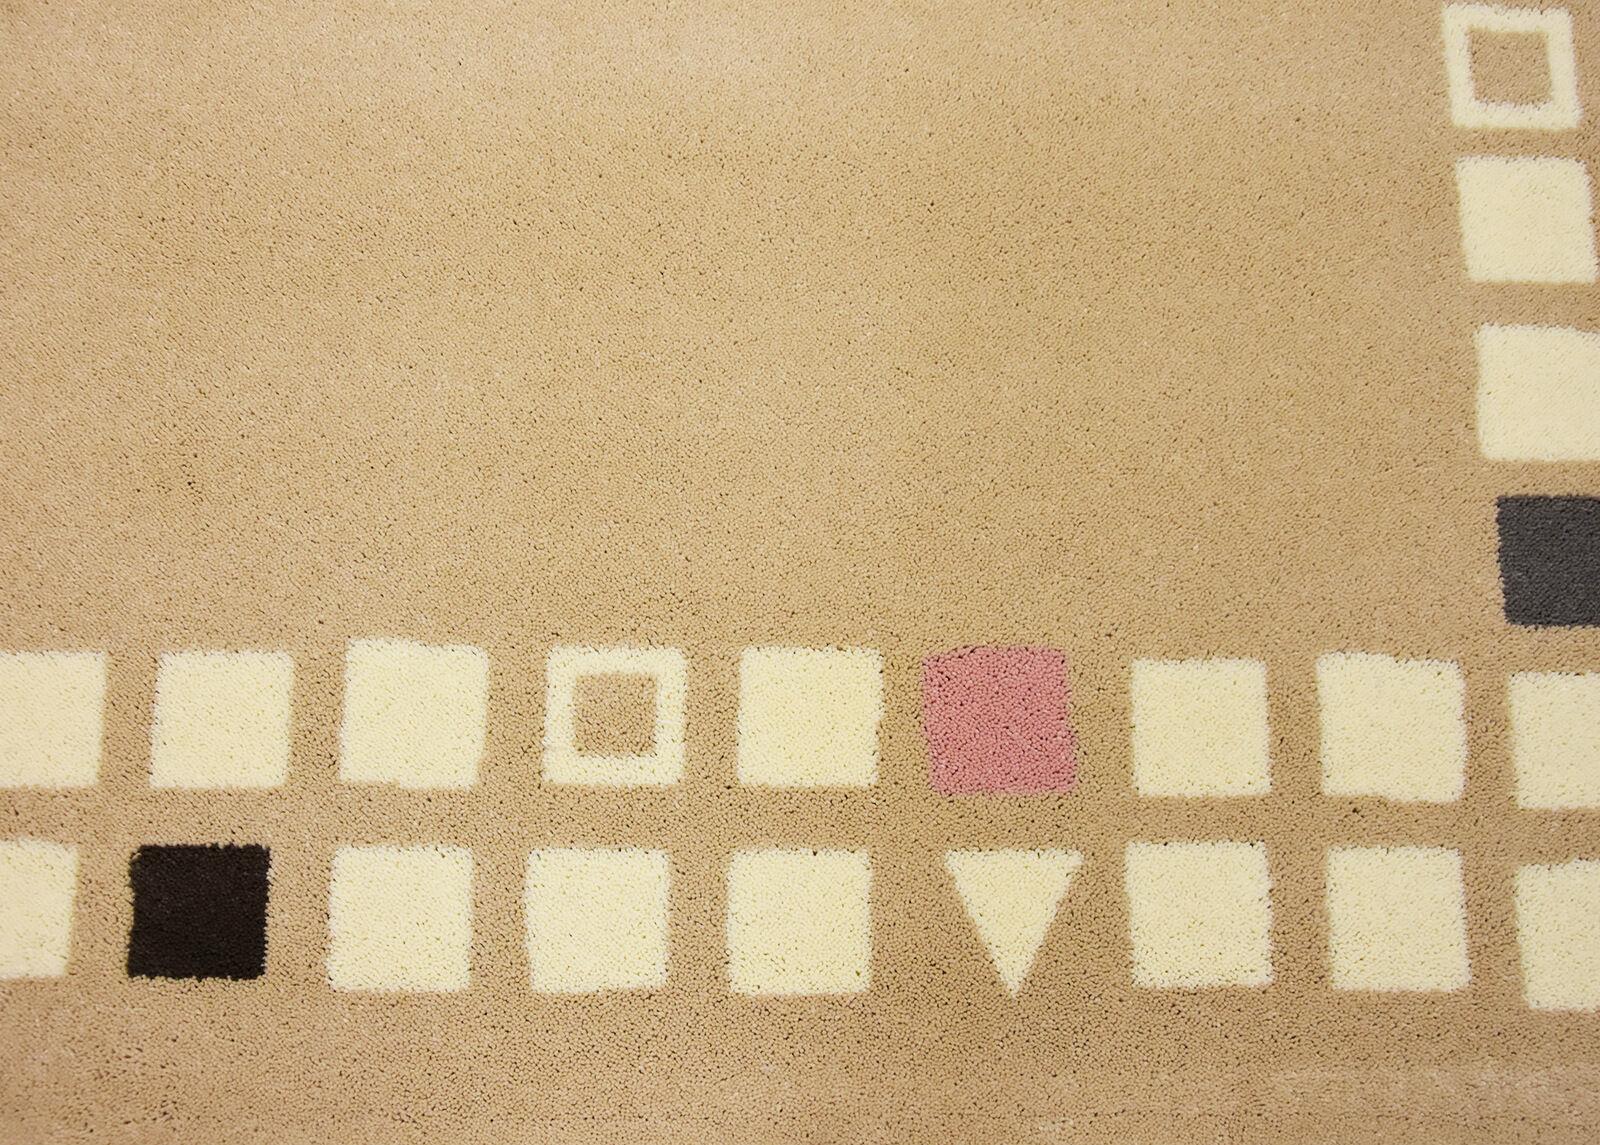 Image of Moldabela Matto 120x170 cm